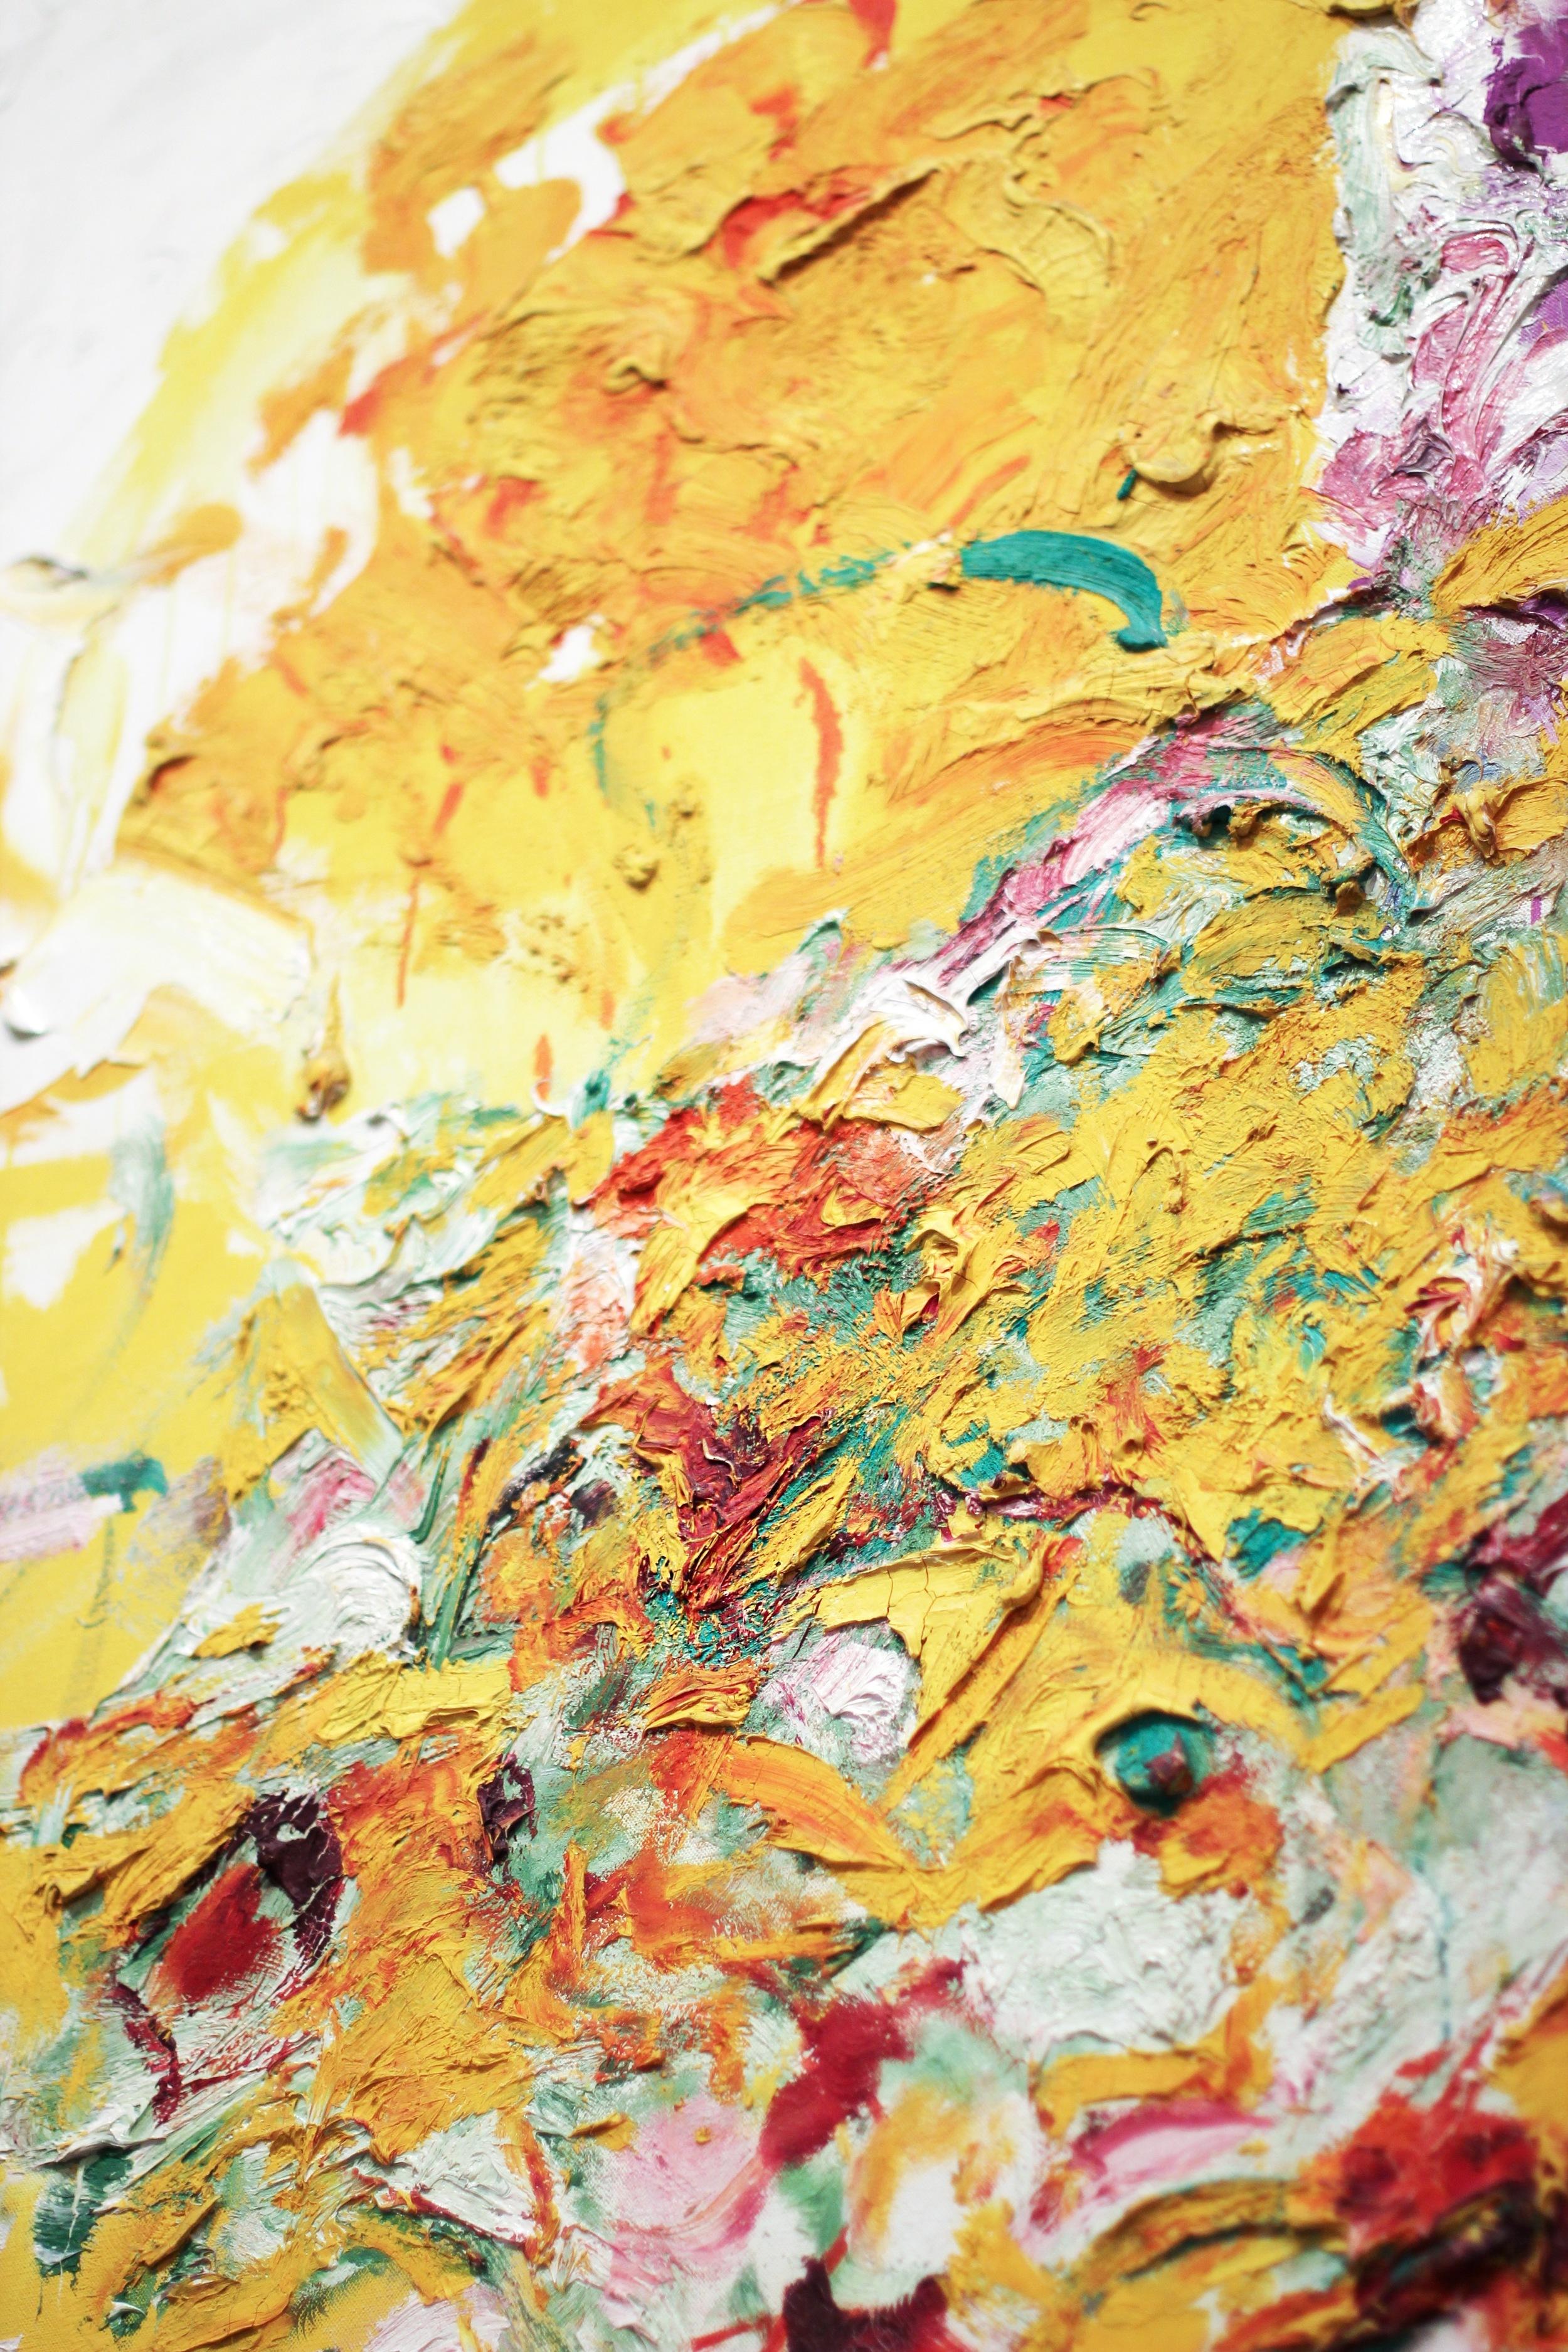 Joan Mitchell's Sunflowers